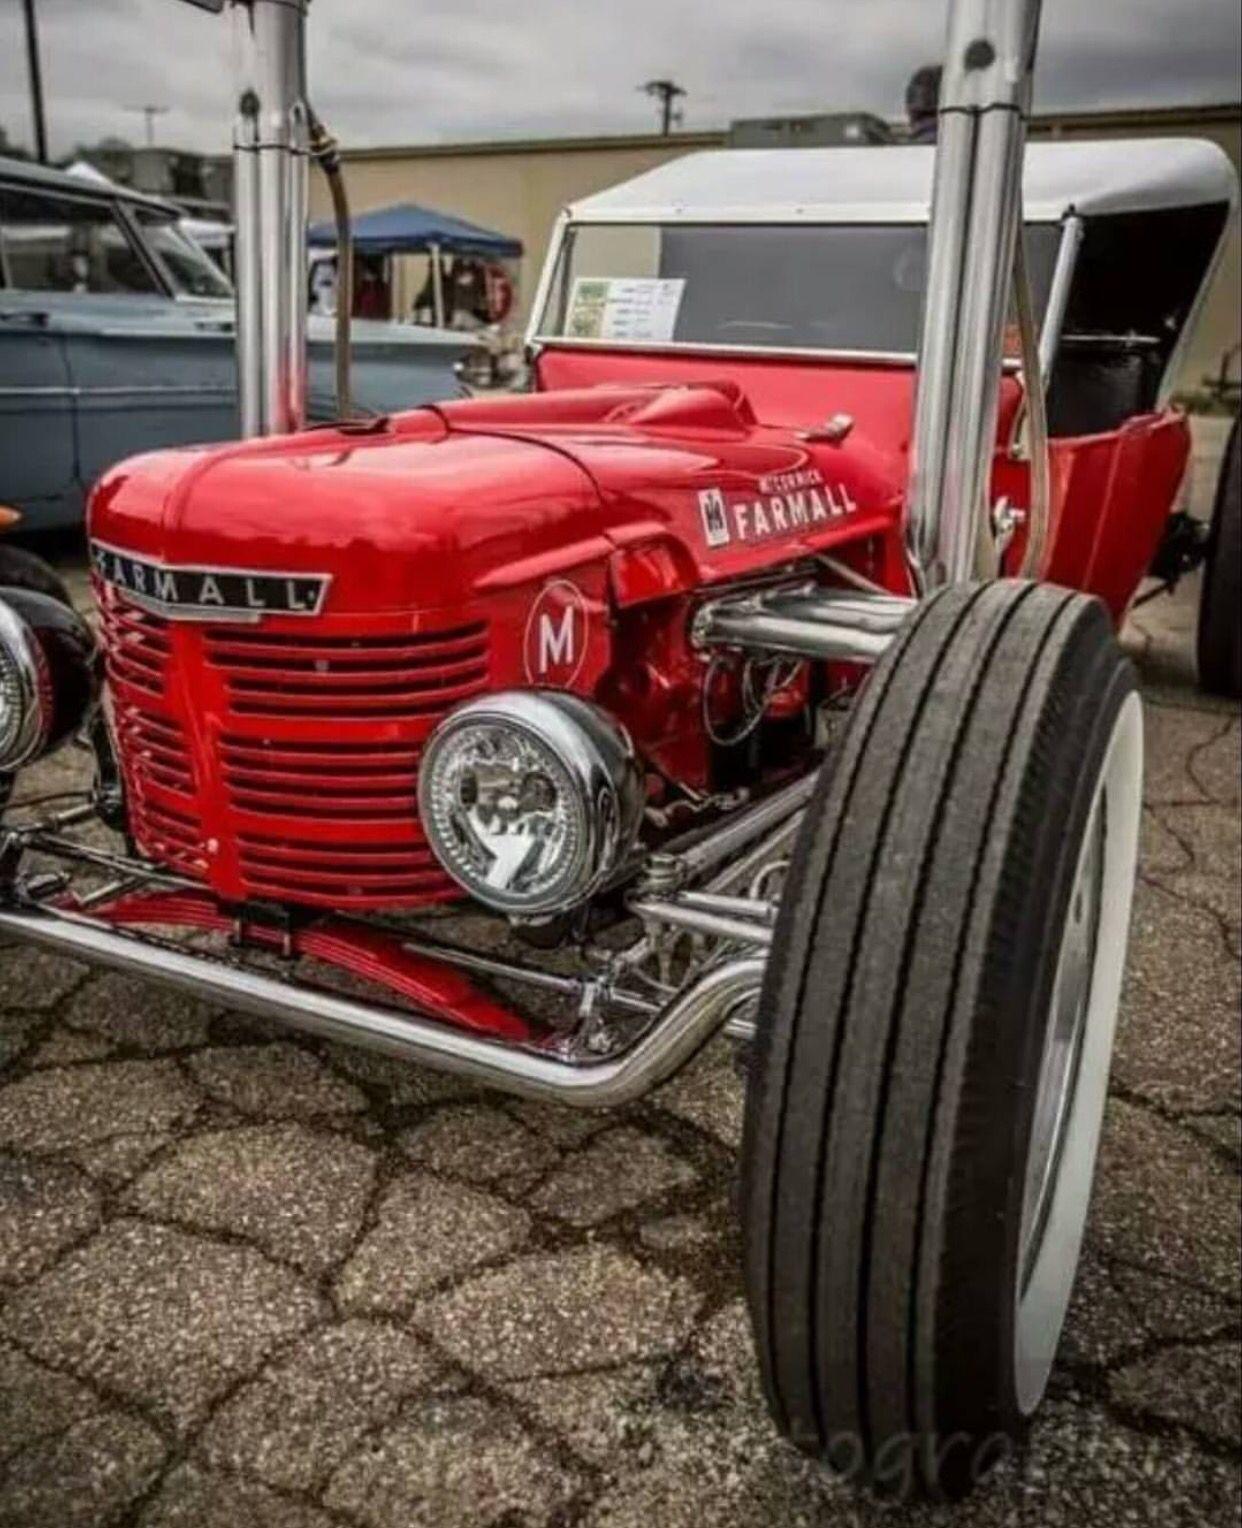 farmall m hot rod   hot rods & rat rods   cars, antique ... hot rod humbucker wiring schematics hot rod tractor wiring